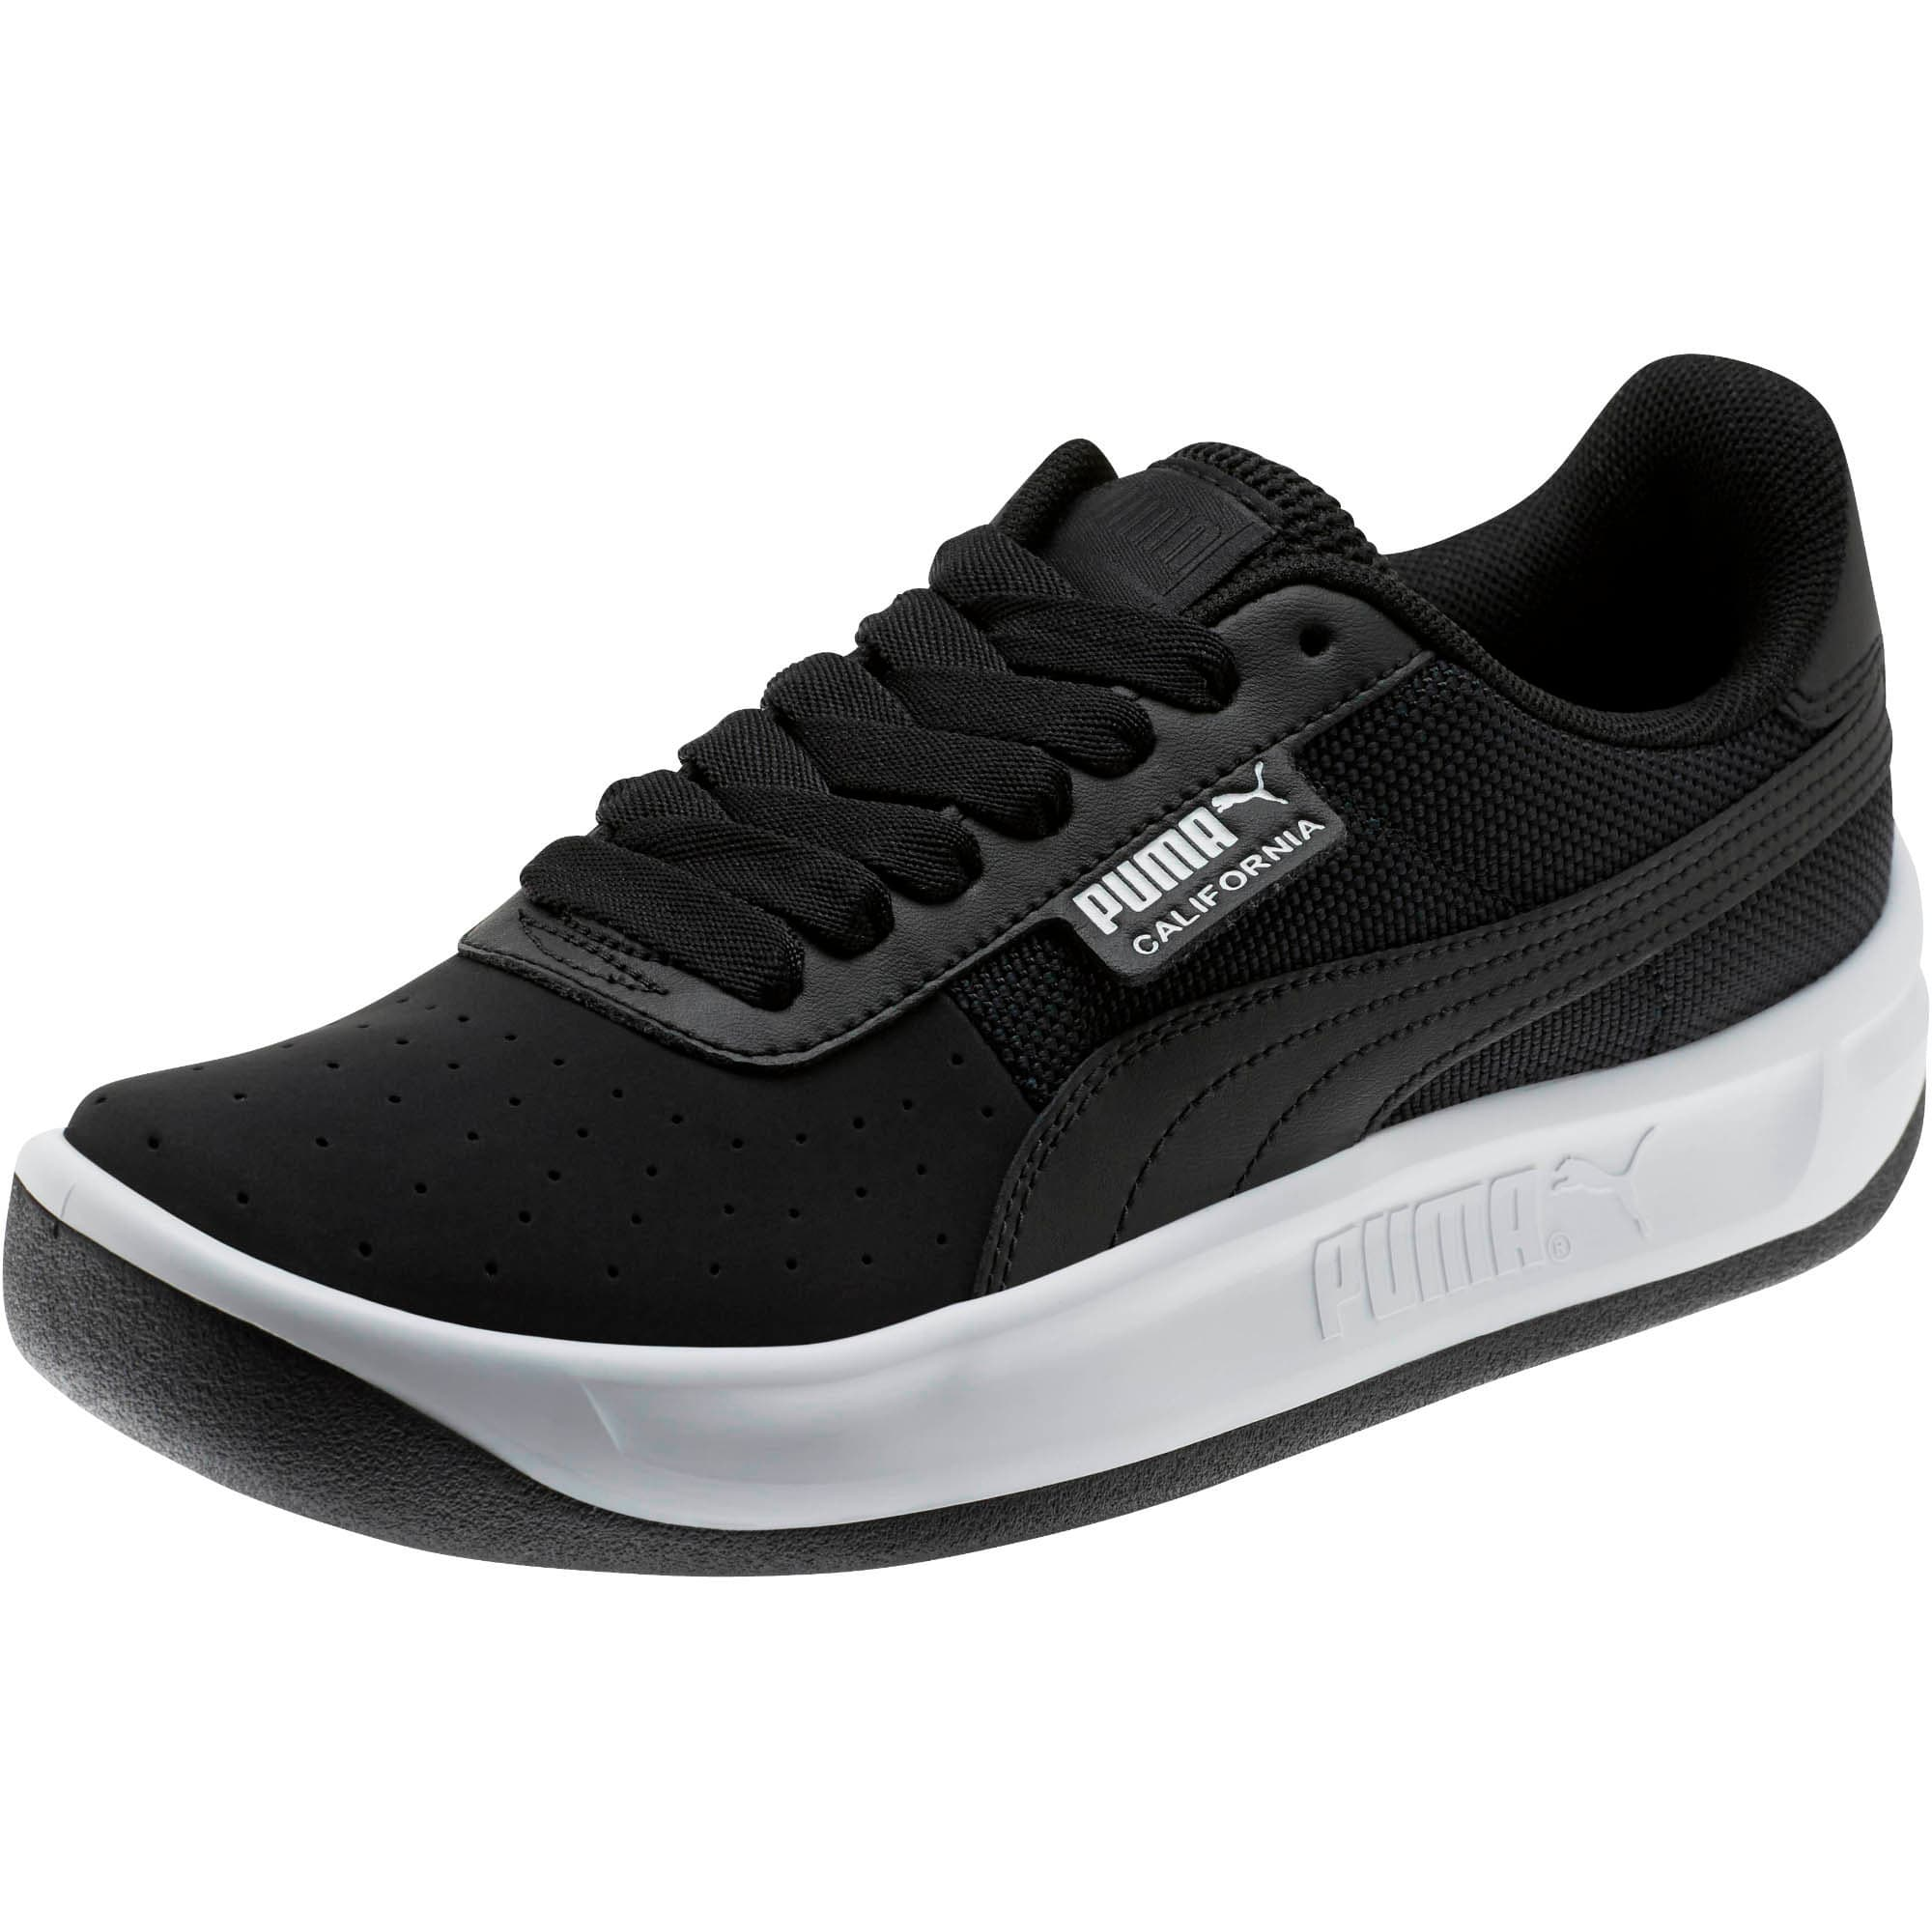 Thumbnail 1 of California Sneakers JR, P Black-P White-P Black, medium